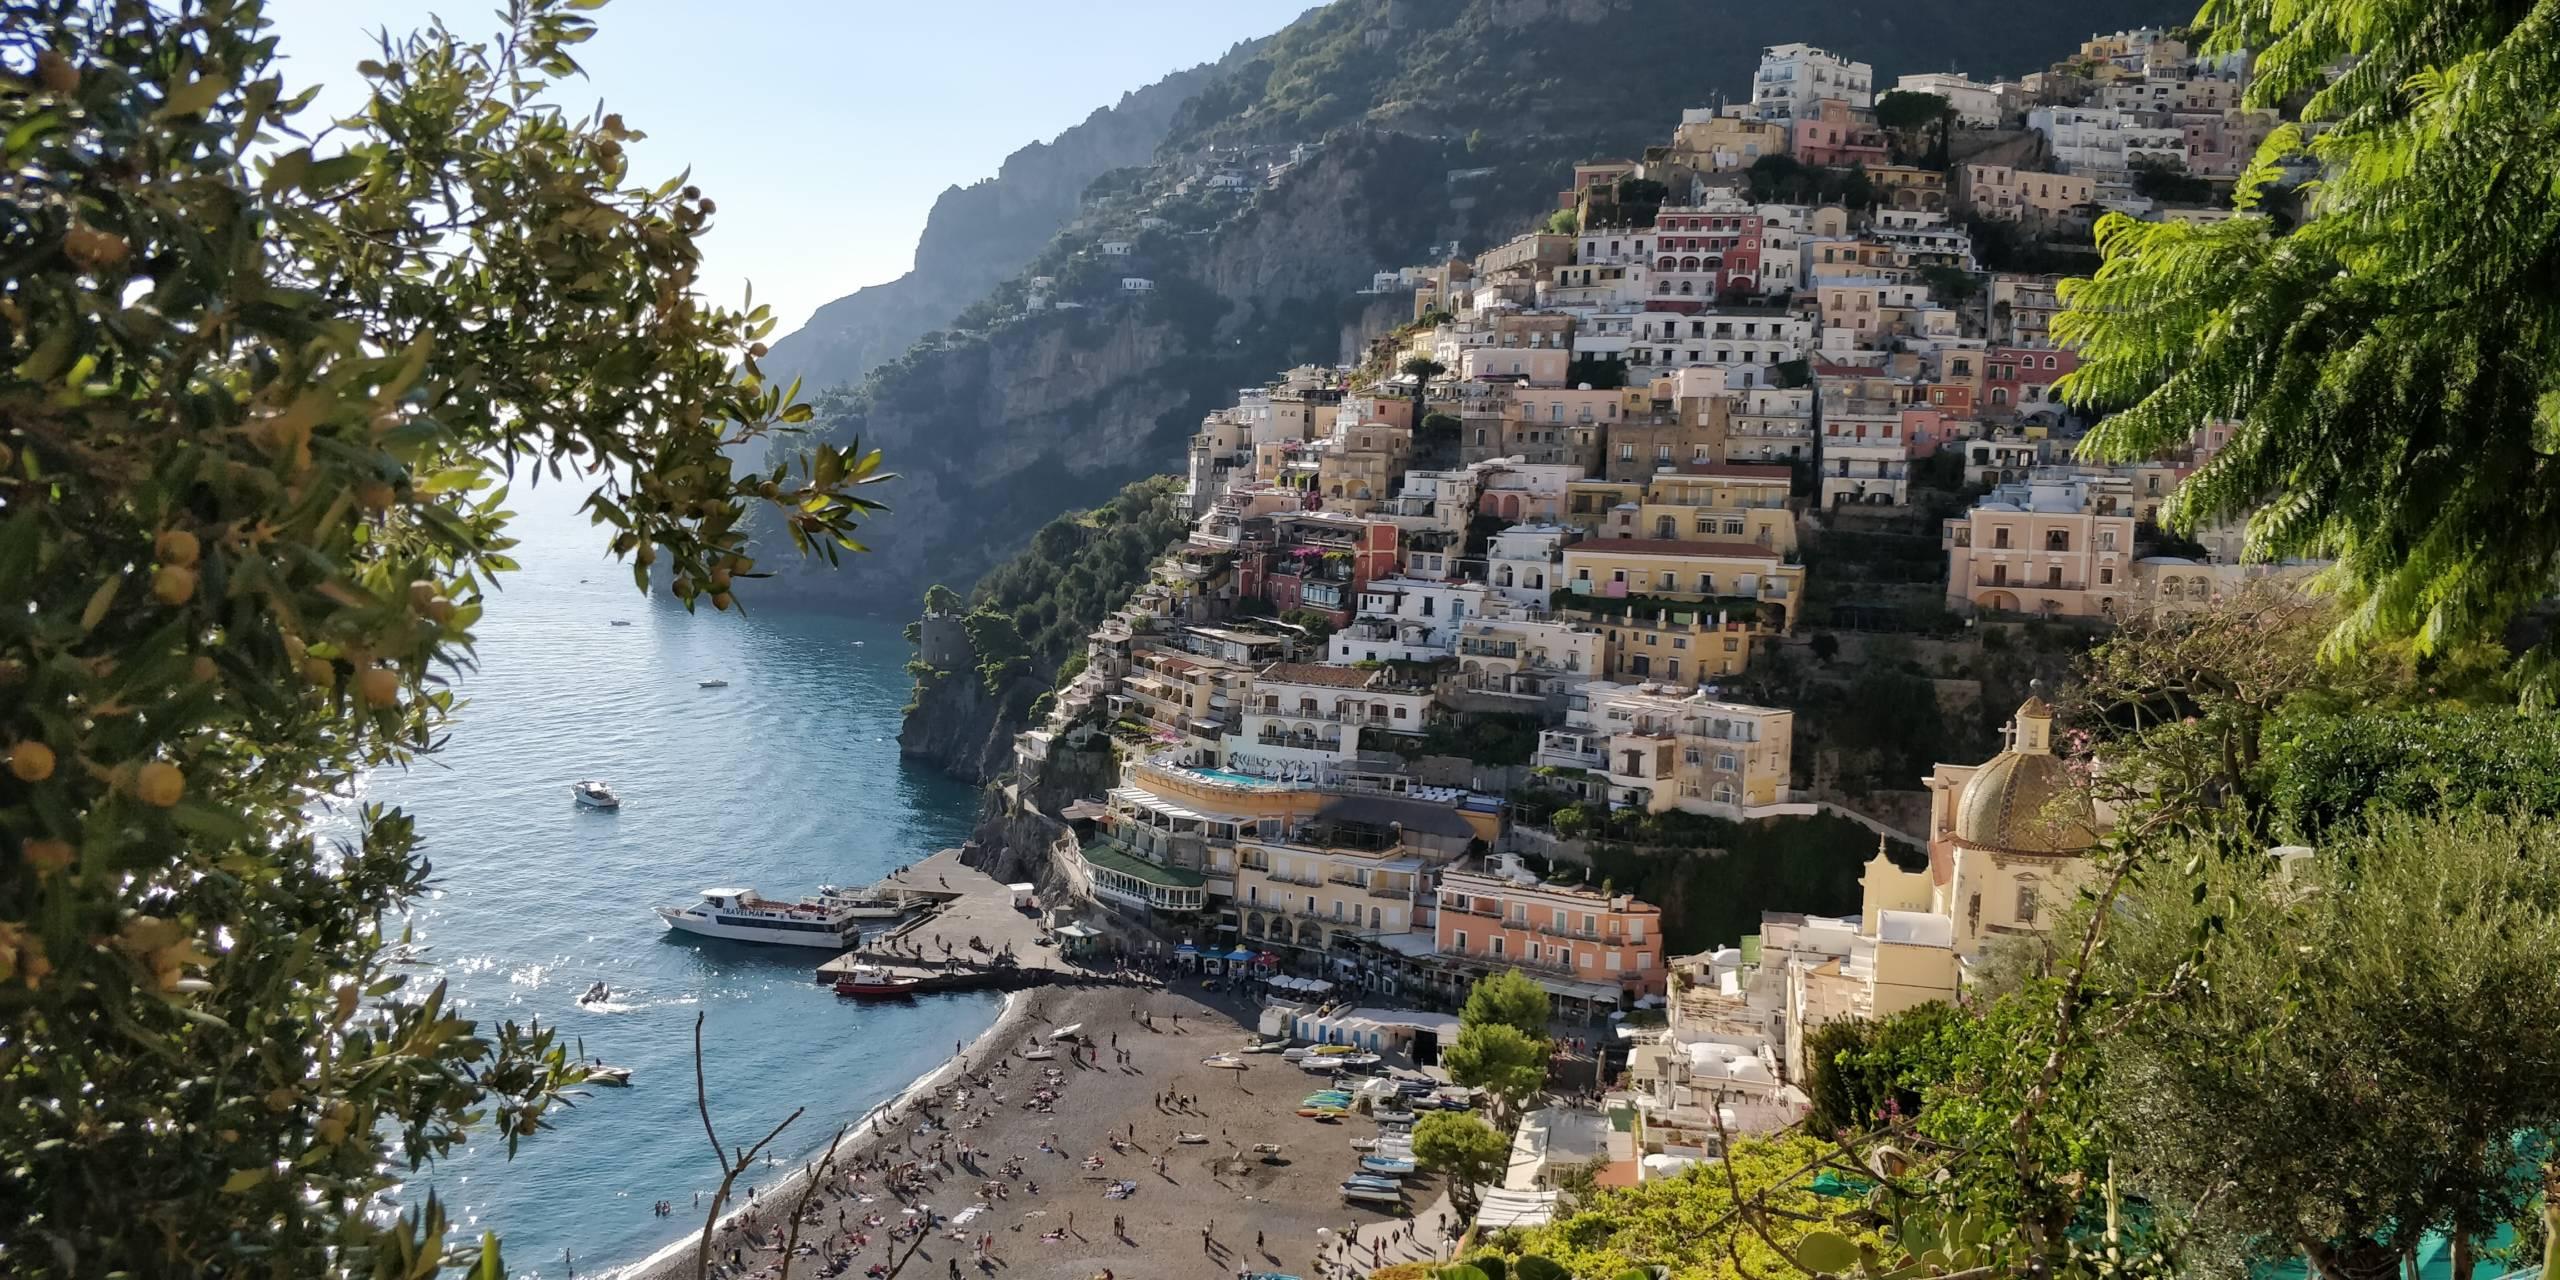 Where to Splurge and Where to Save on Italy's Amalfi Coast